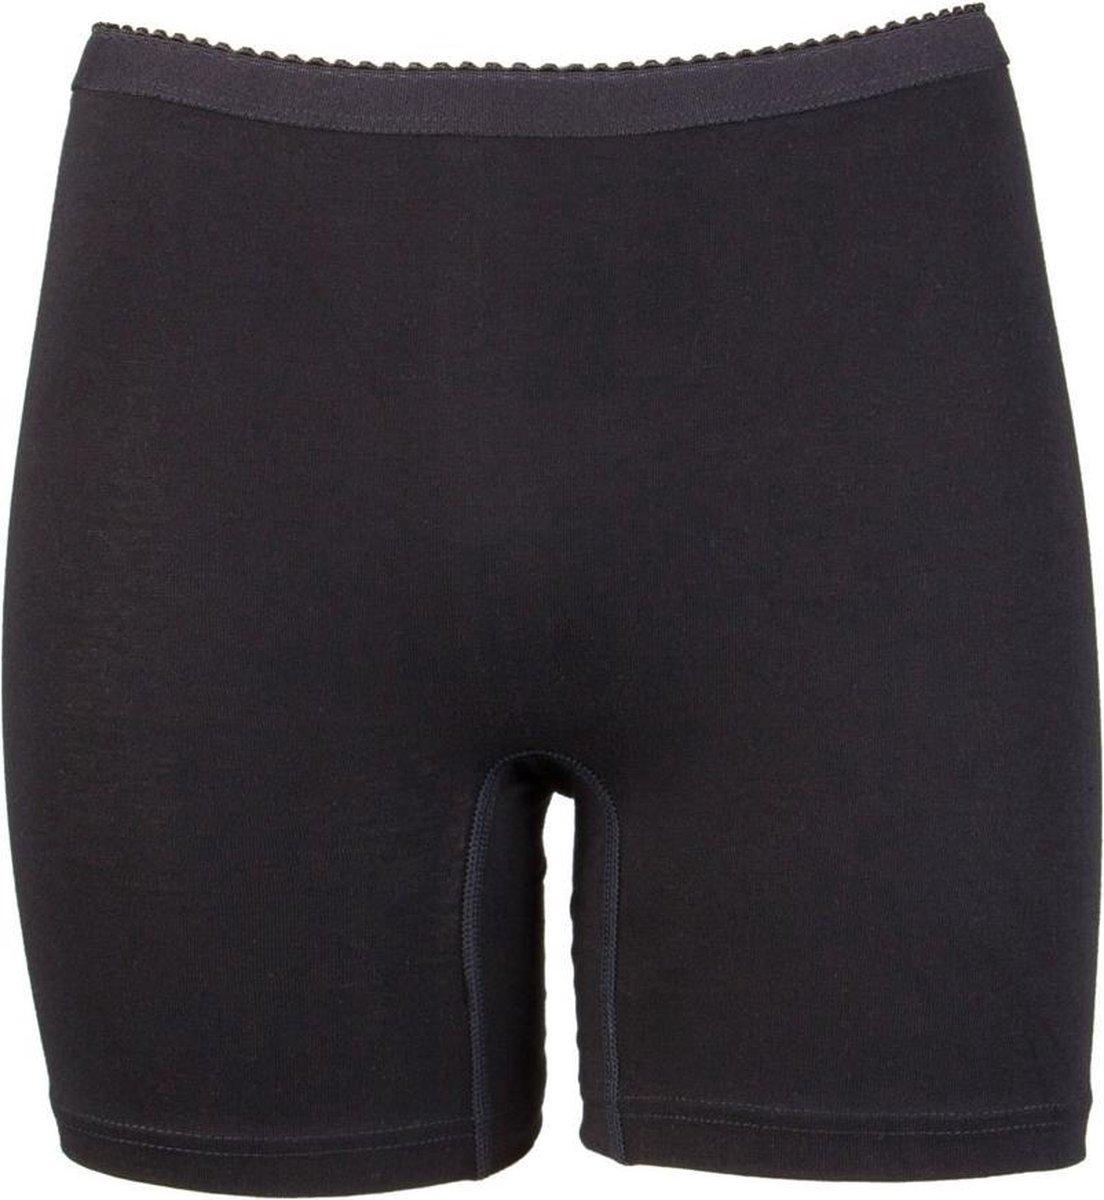 Beeren Dames Softly Short Long zwart-M